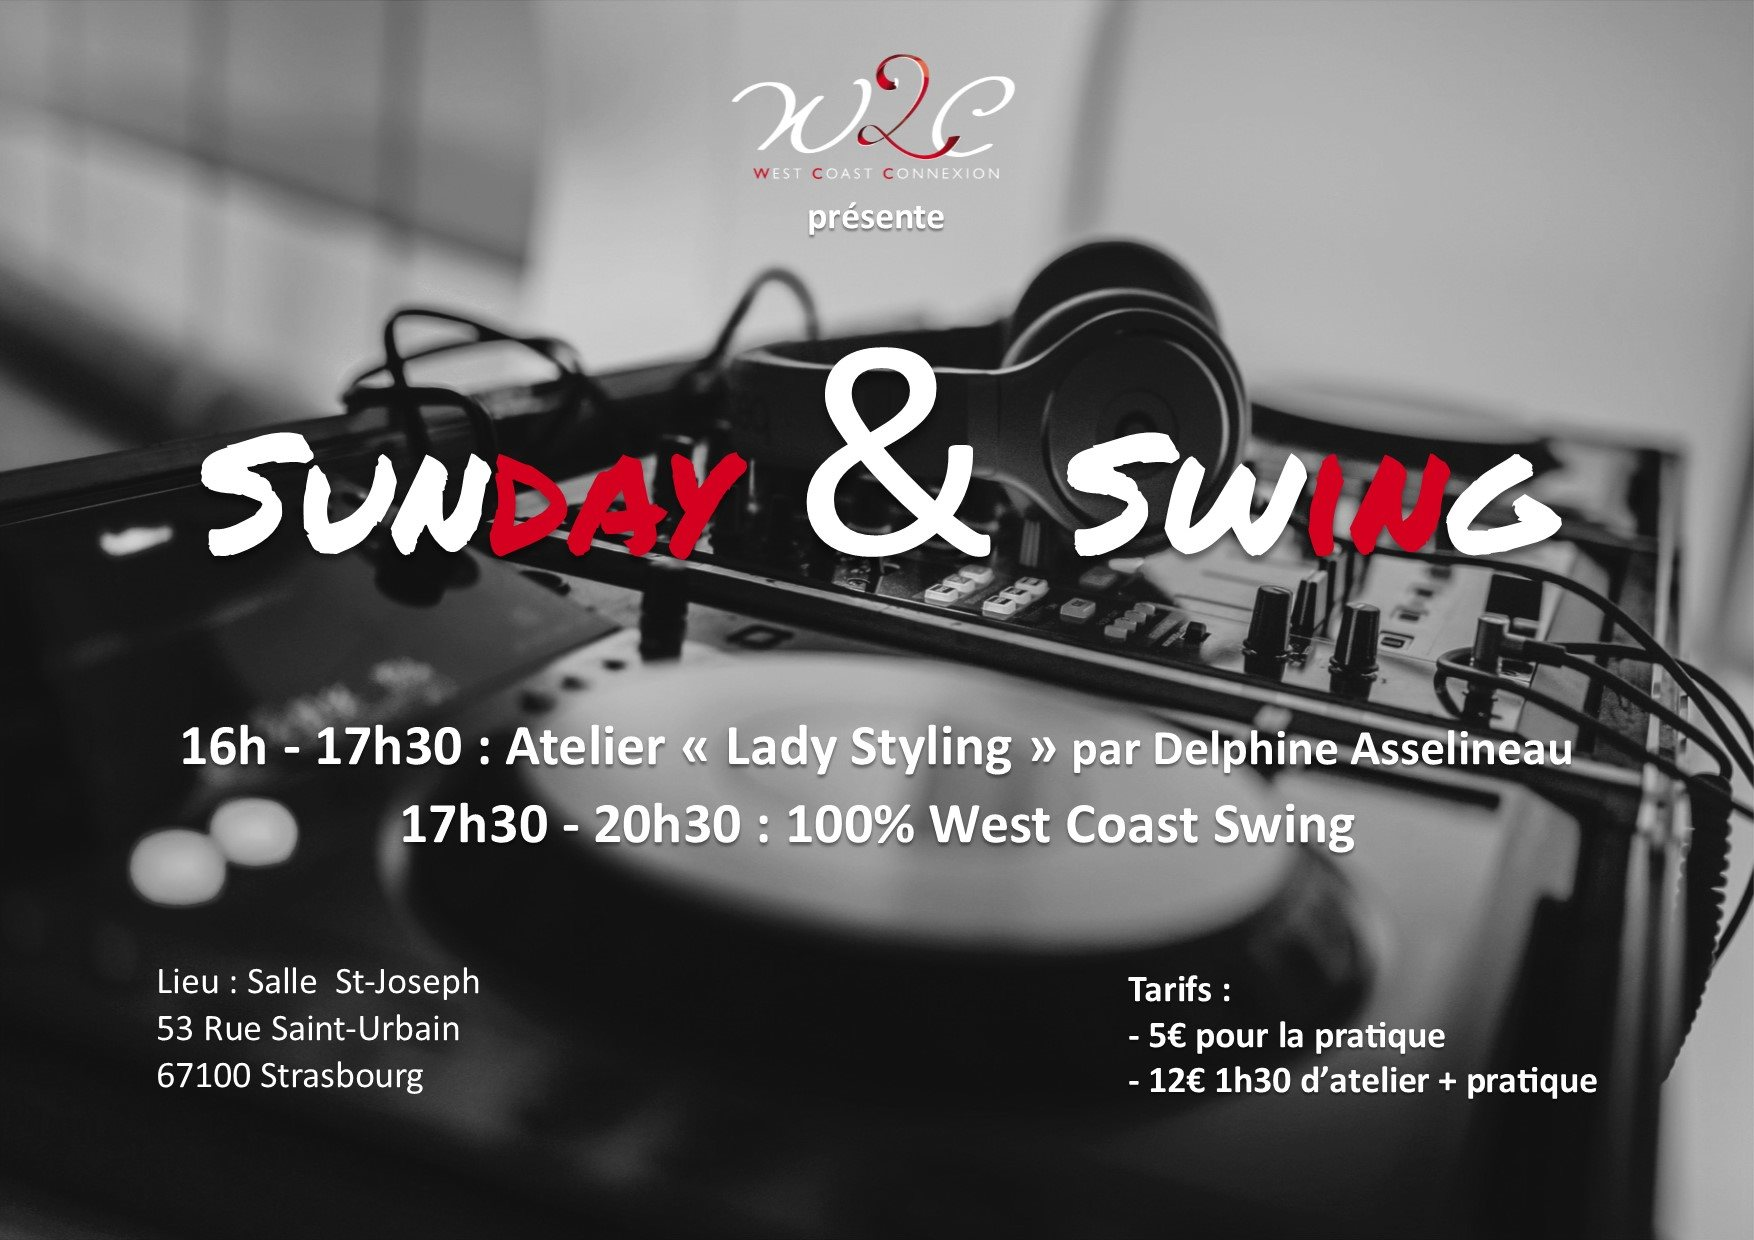 Sunday & Swing avec atelier